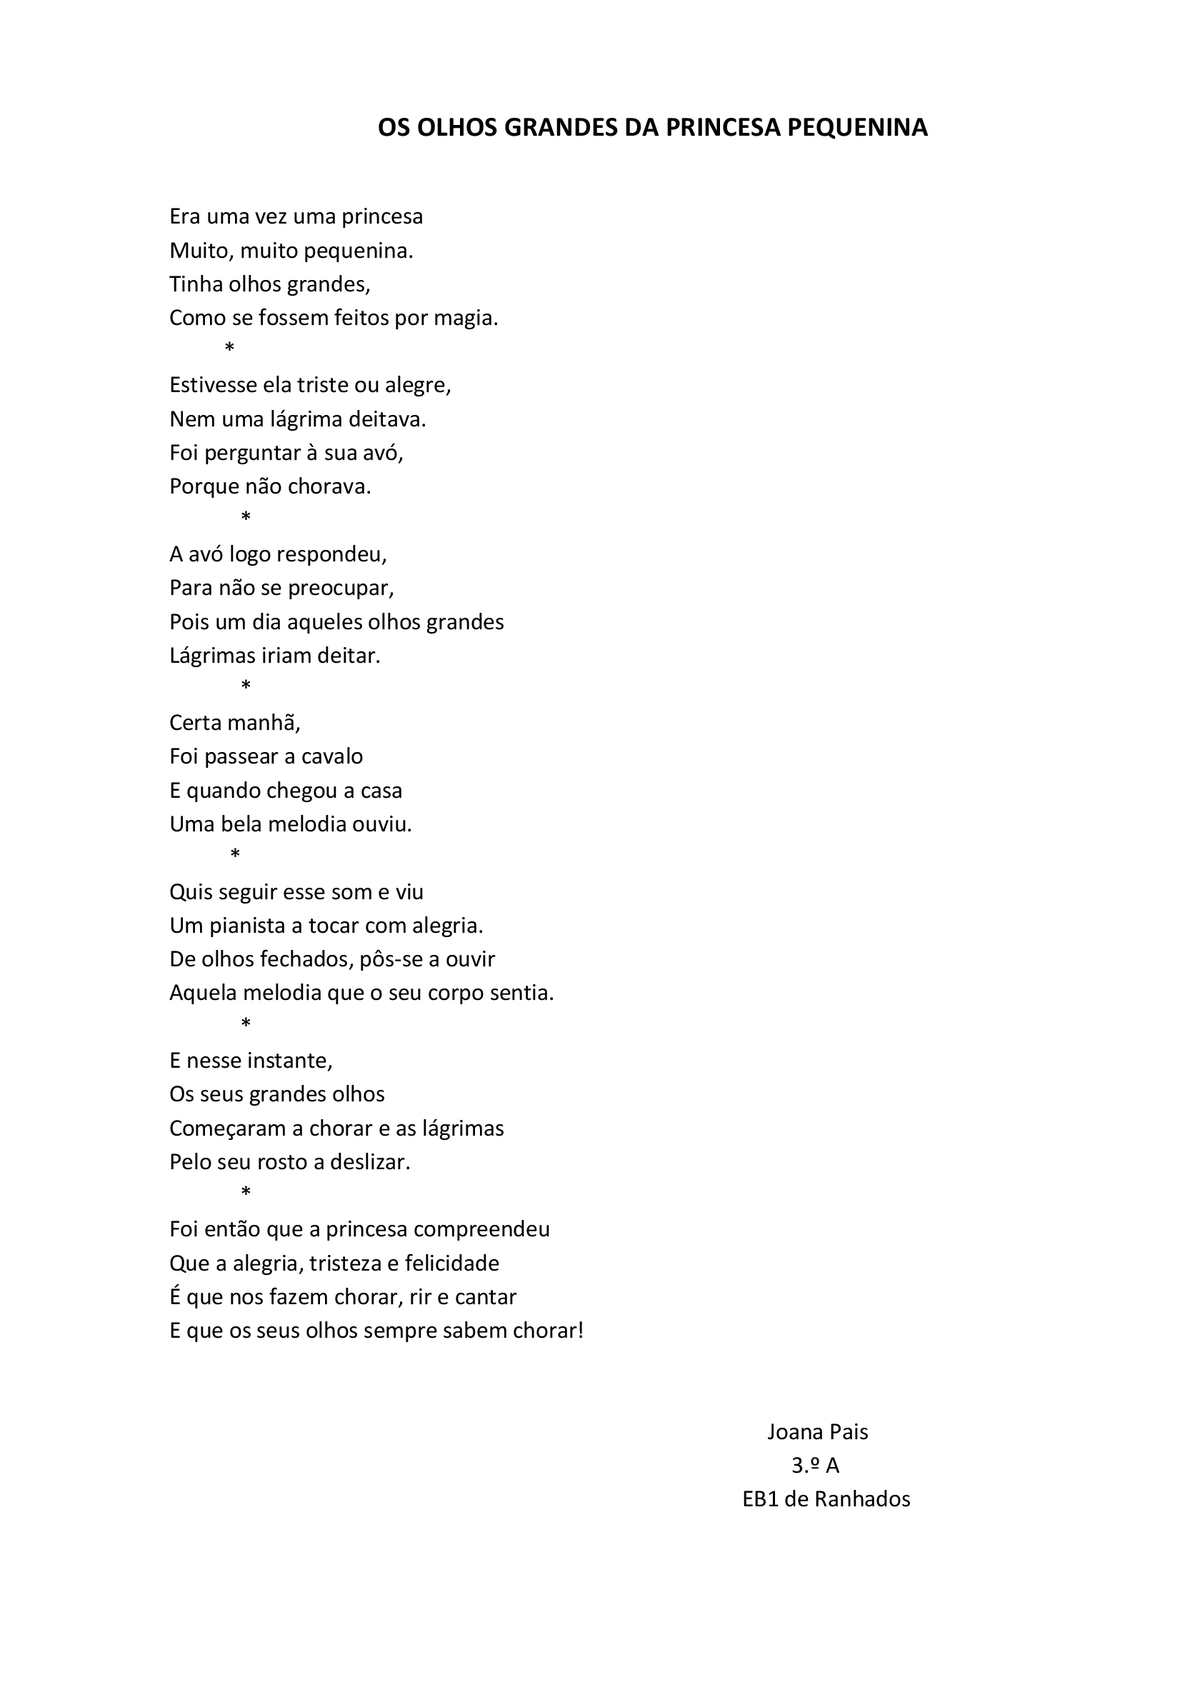 Calaméo Poemas Eb1 De Ranhados